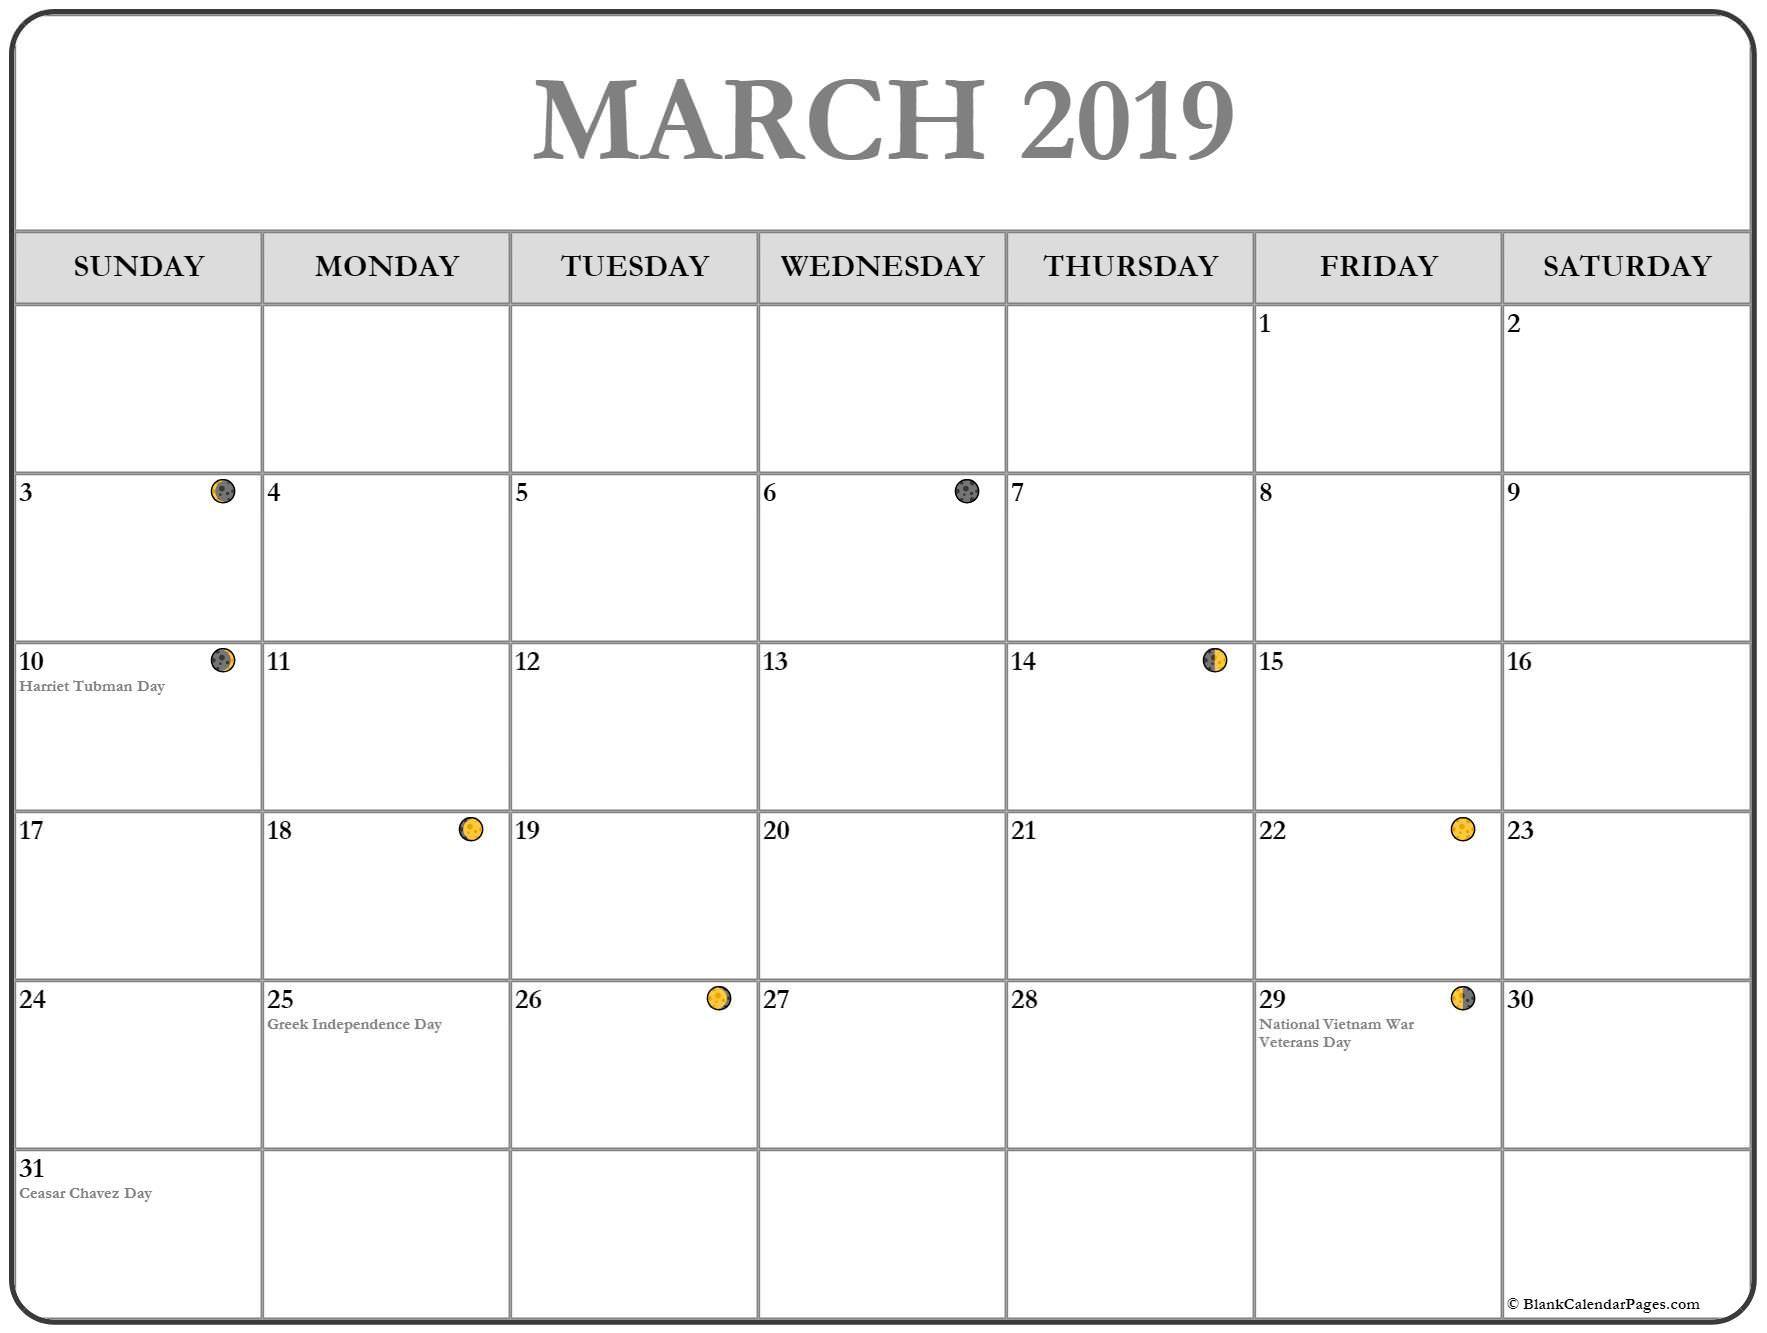 2019 March Moon Phases Template Calendar June 2019 Calendar